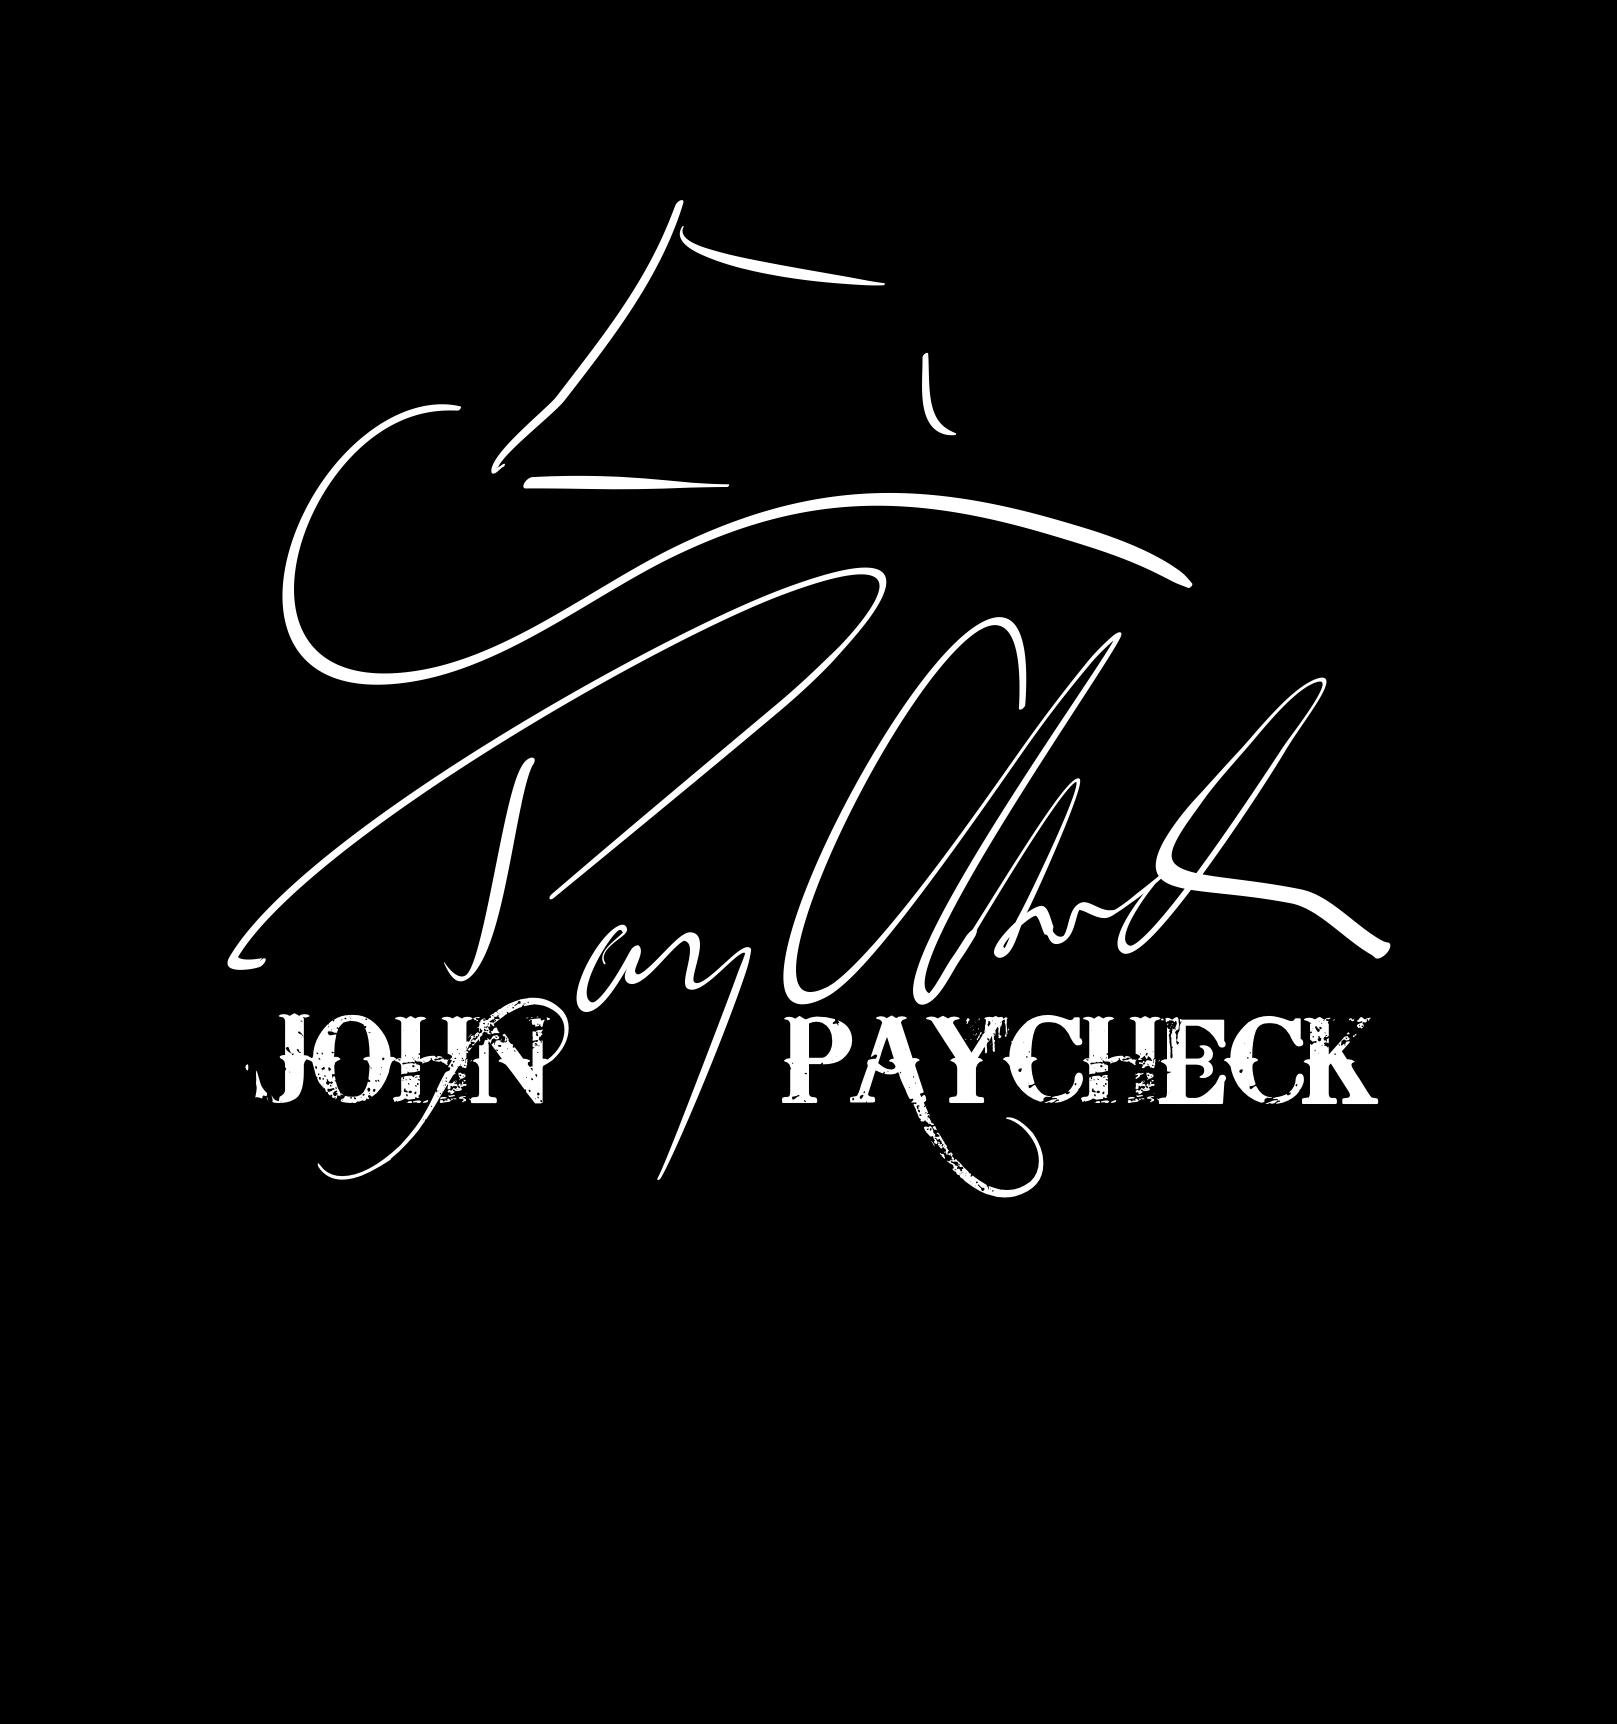 John PayCheck's Cavalry Post Merch Shop